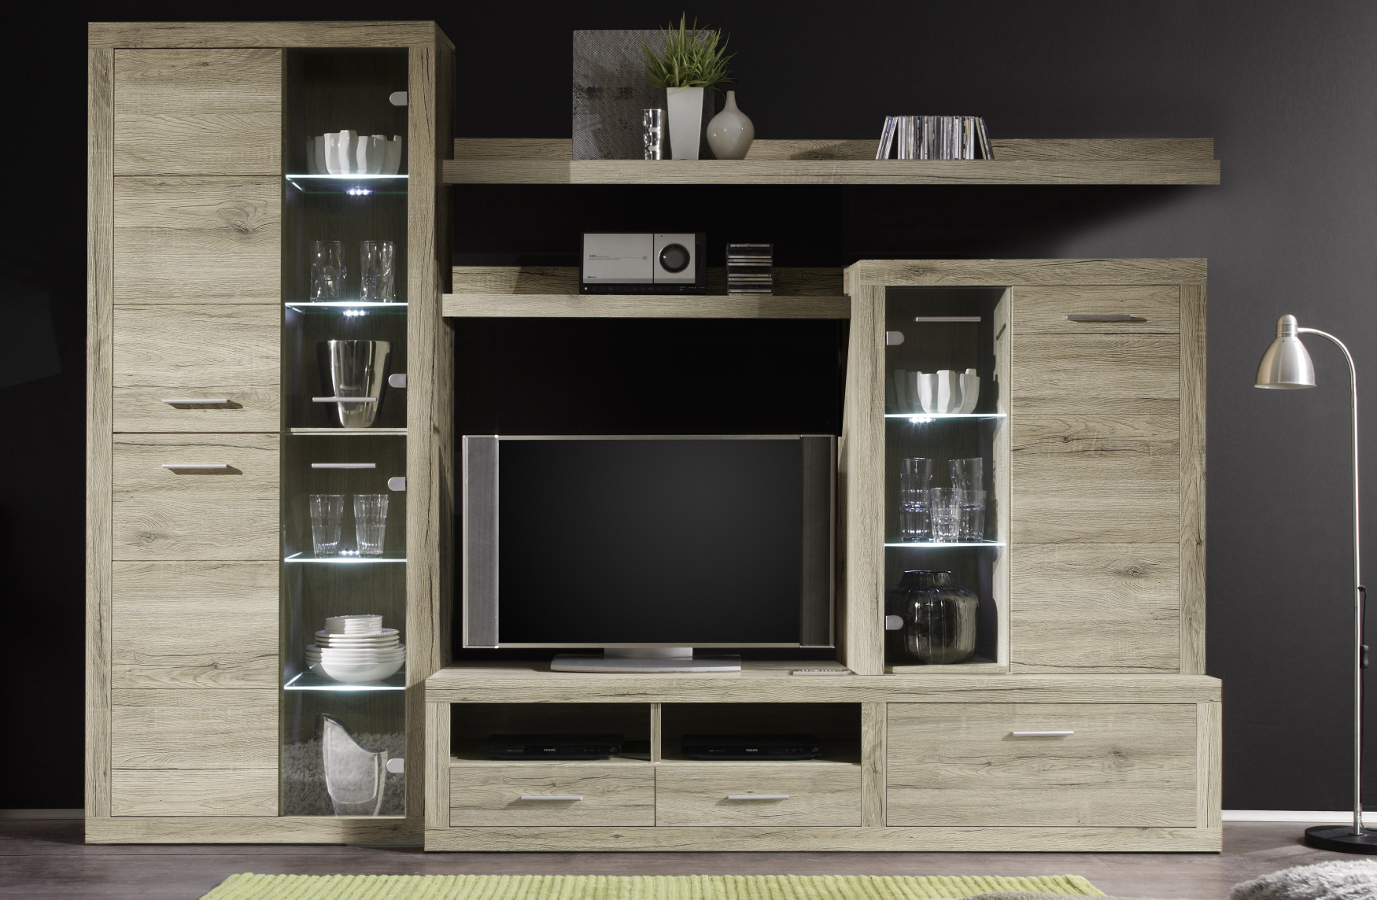 wohnw nde seite 18. Black Bedroom Furniture Sets. Home Design Ideas